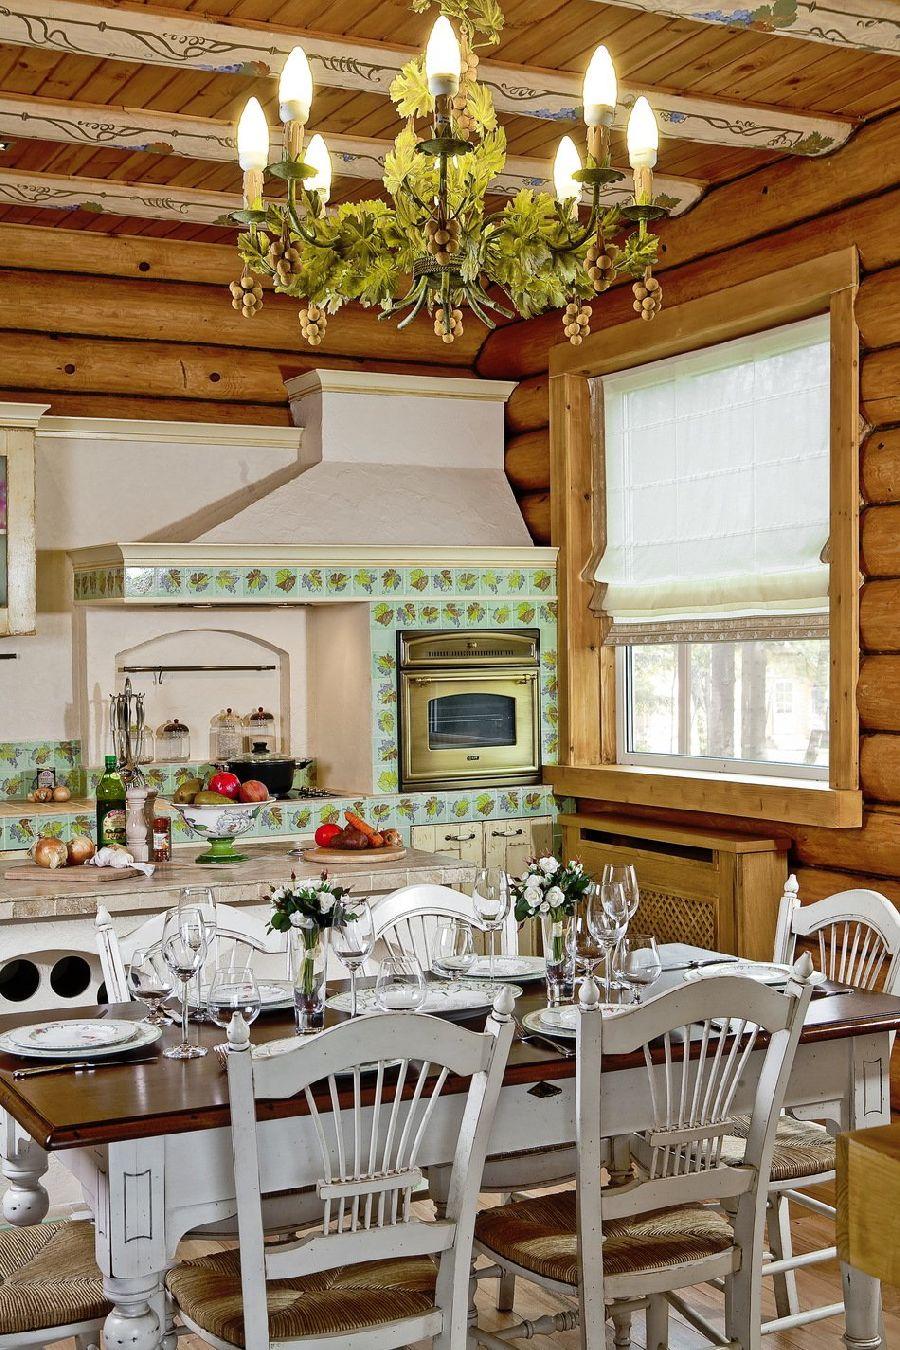 adelaparvu.com despre casa din barne de lemn, casa Rusia 192 mp, designer interior Svetlana Panarin, Foto Evgeniy Kylibaba, Gregory Yashuhin (14)